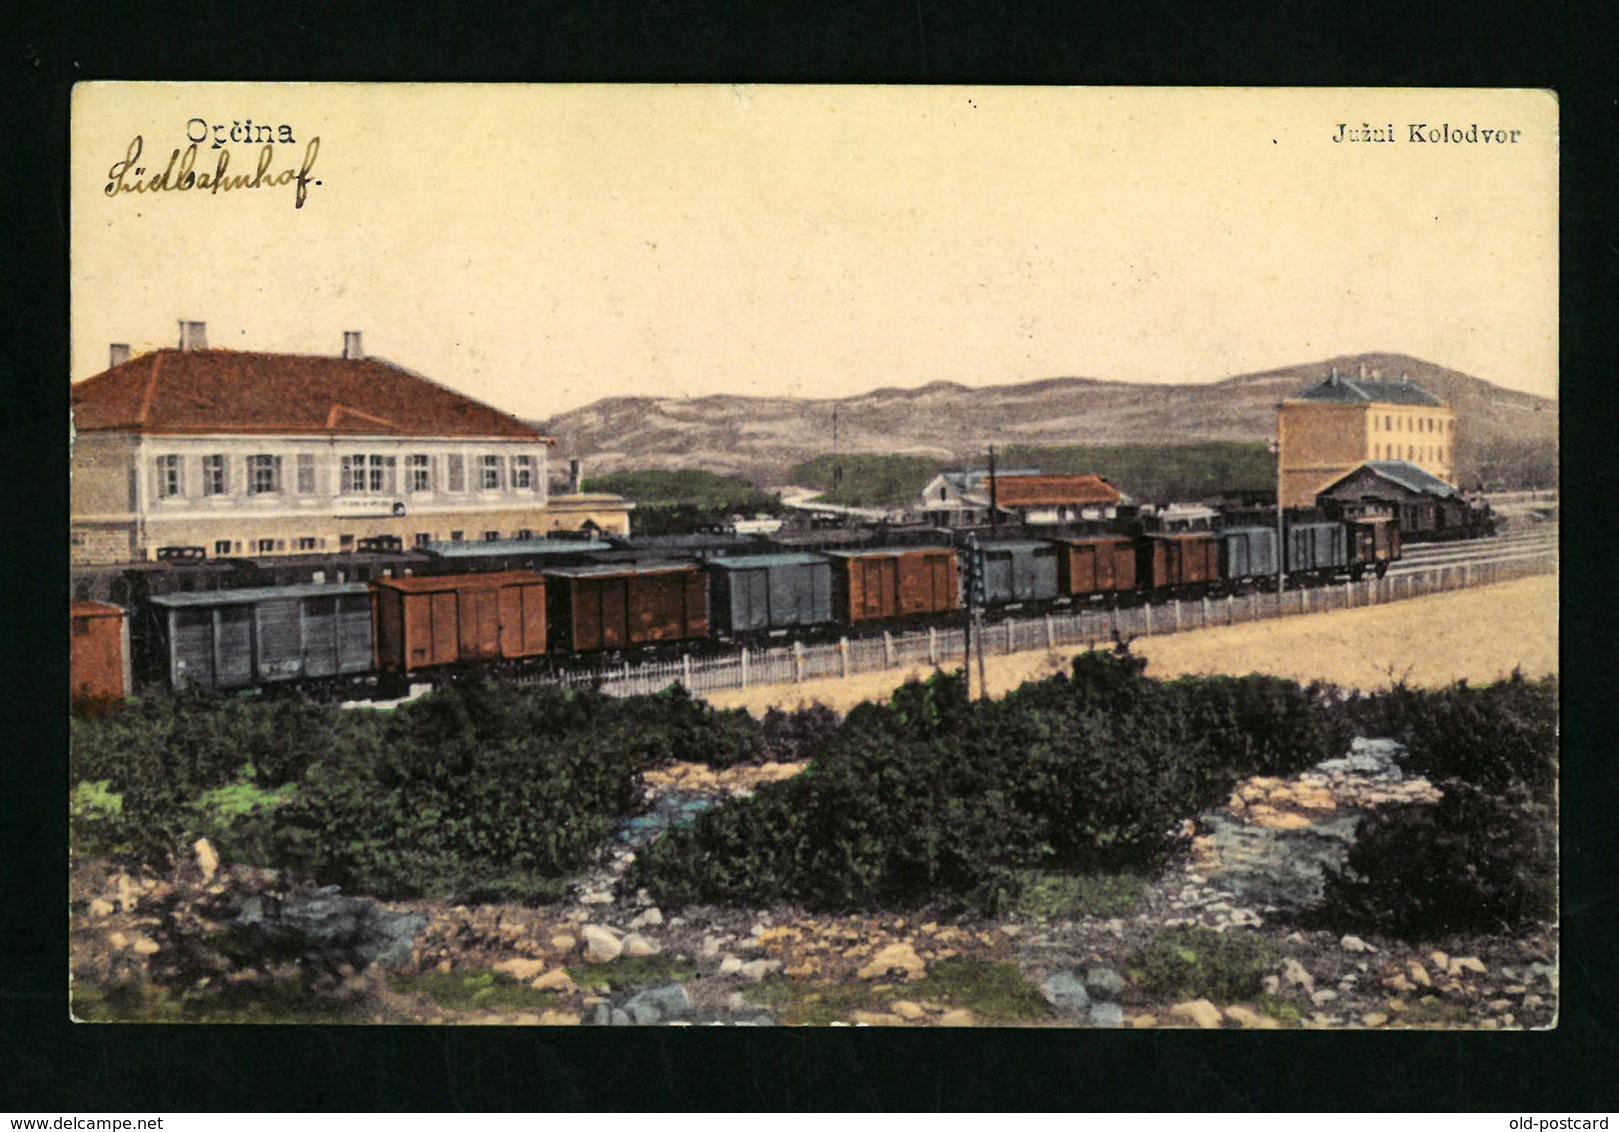 Opcina - Croatia / Bahnhof - Railway Station 1915  VF USED  POSTCARD - Croacia